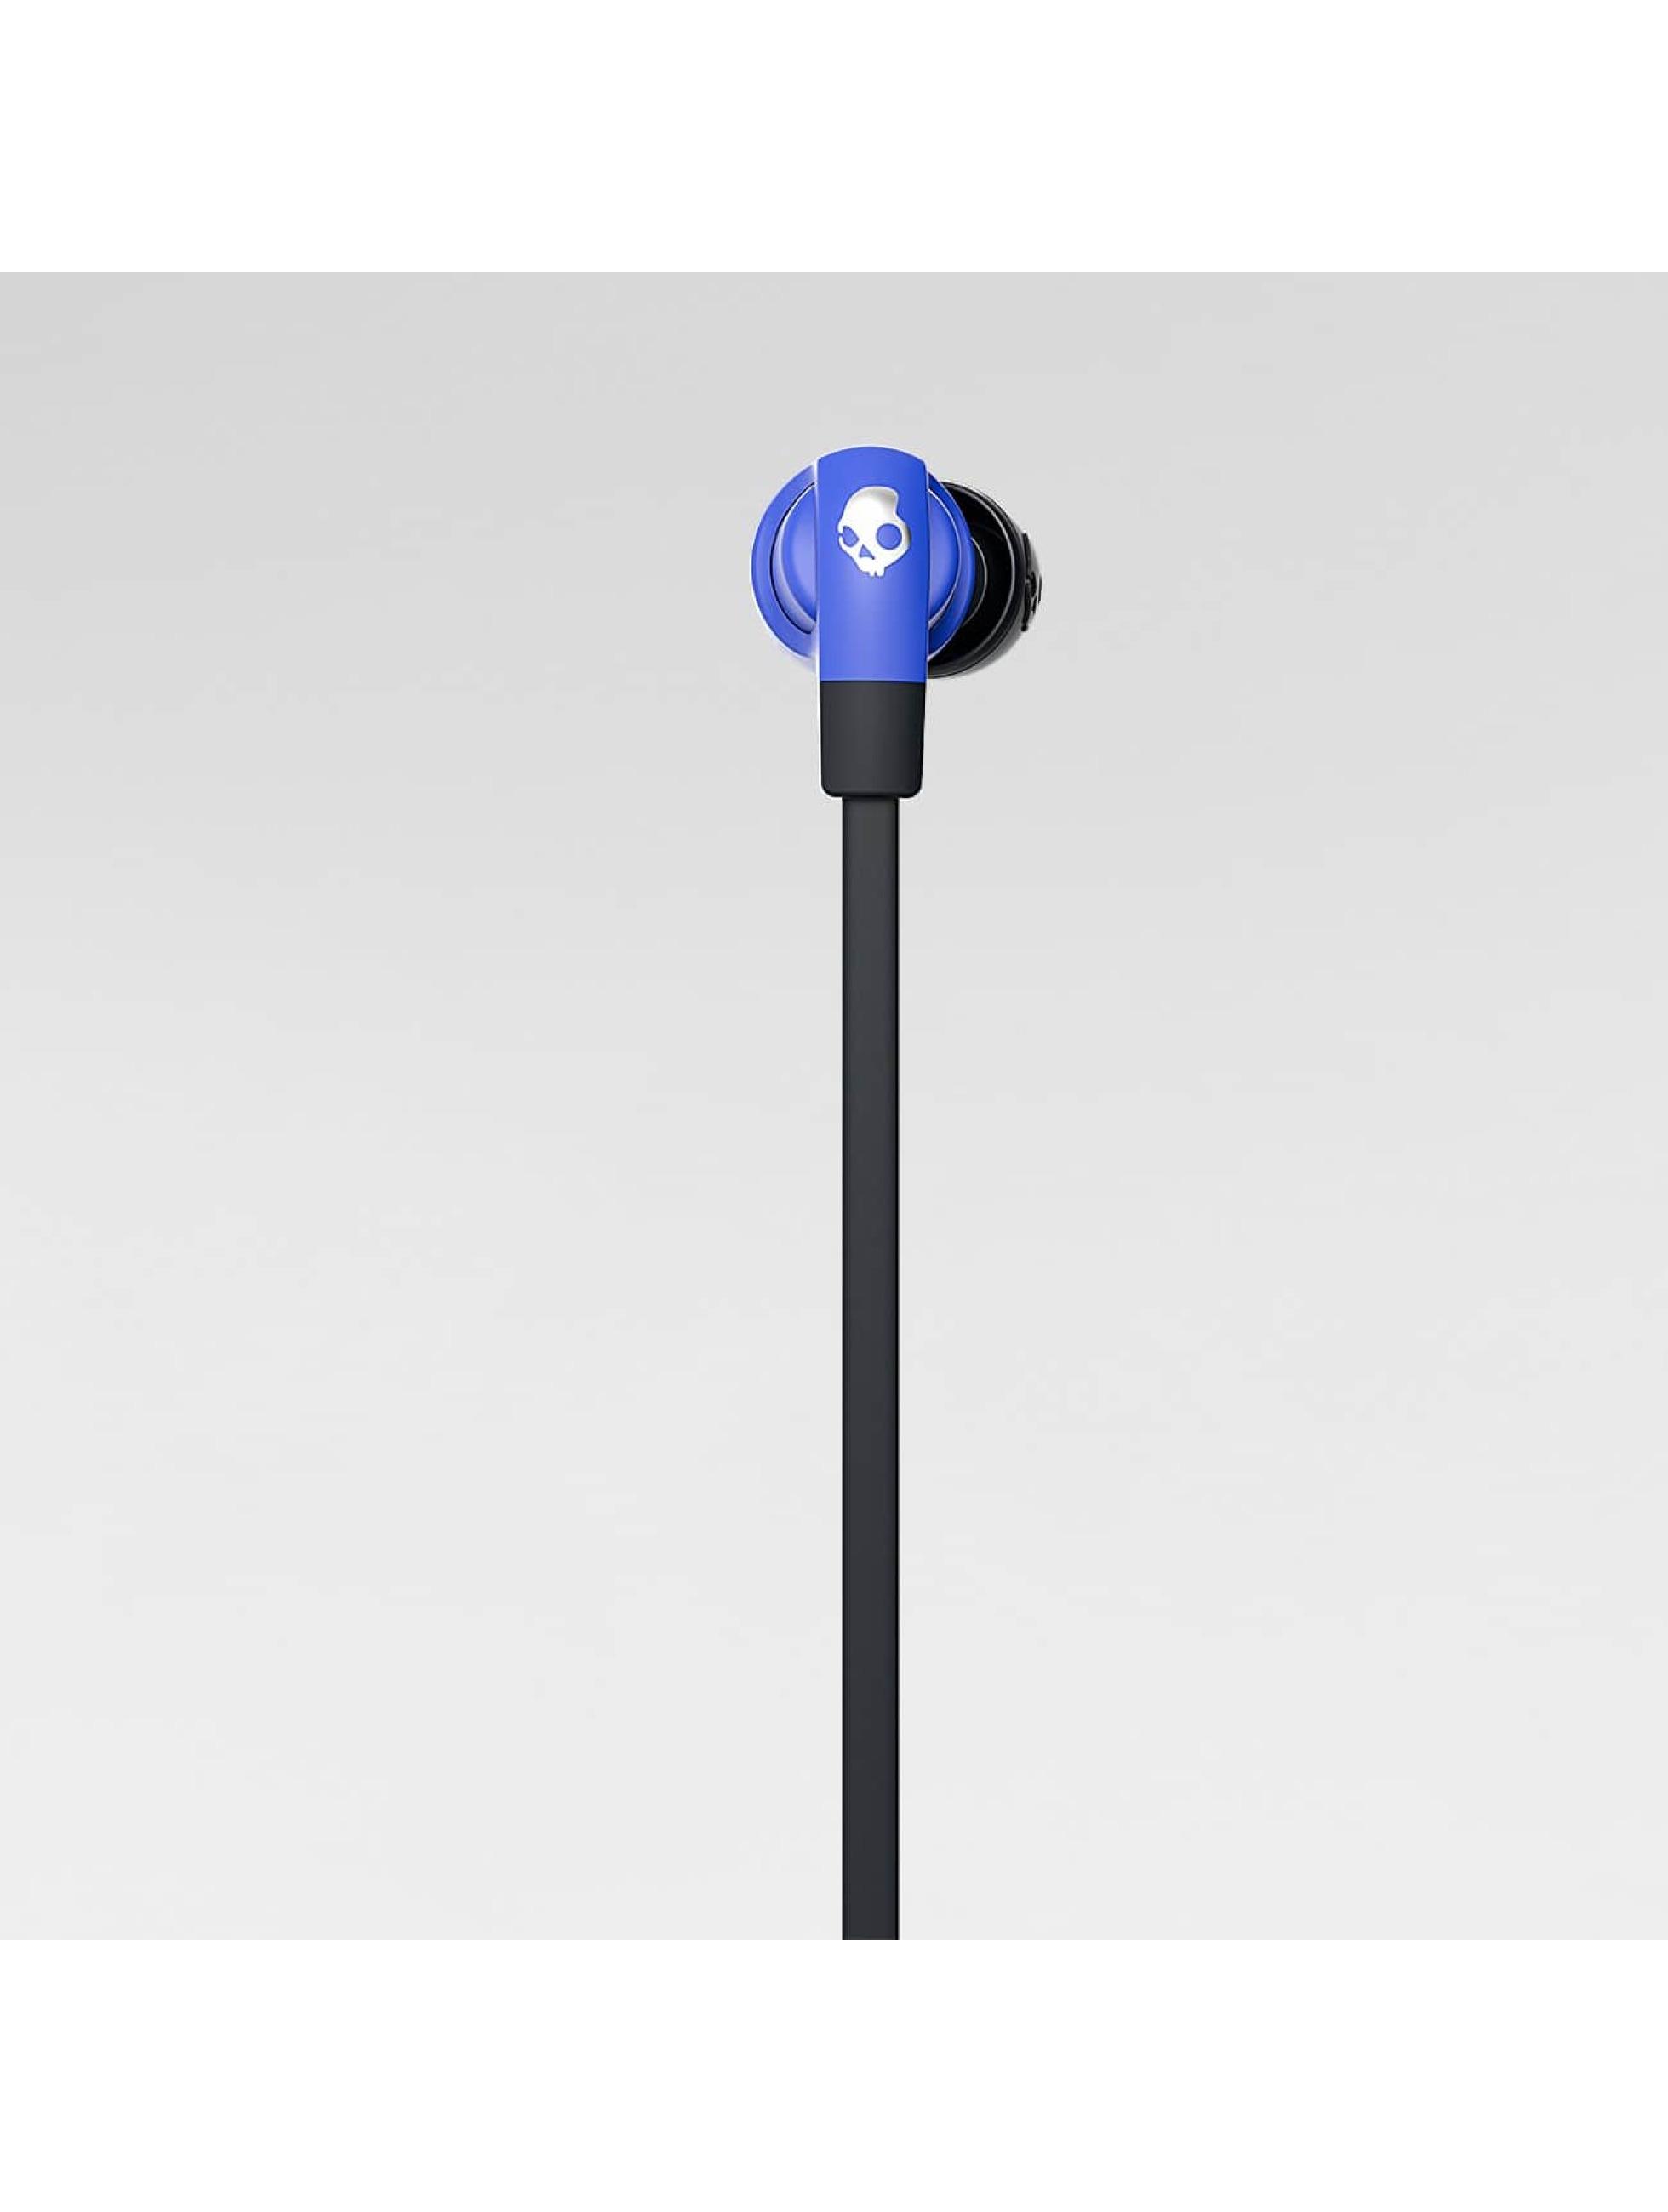 Skullcandy Kopfhörer Smokin Bud 2 Wireless blau